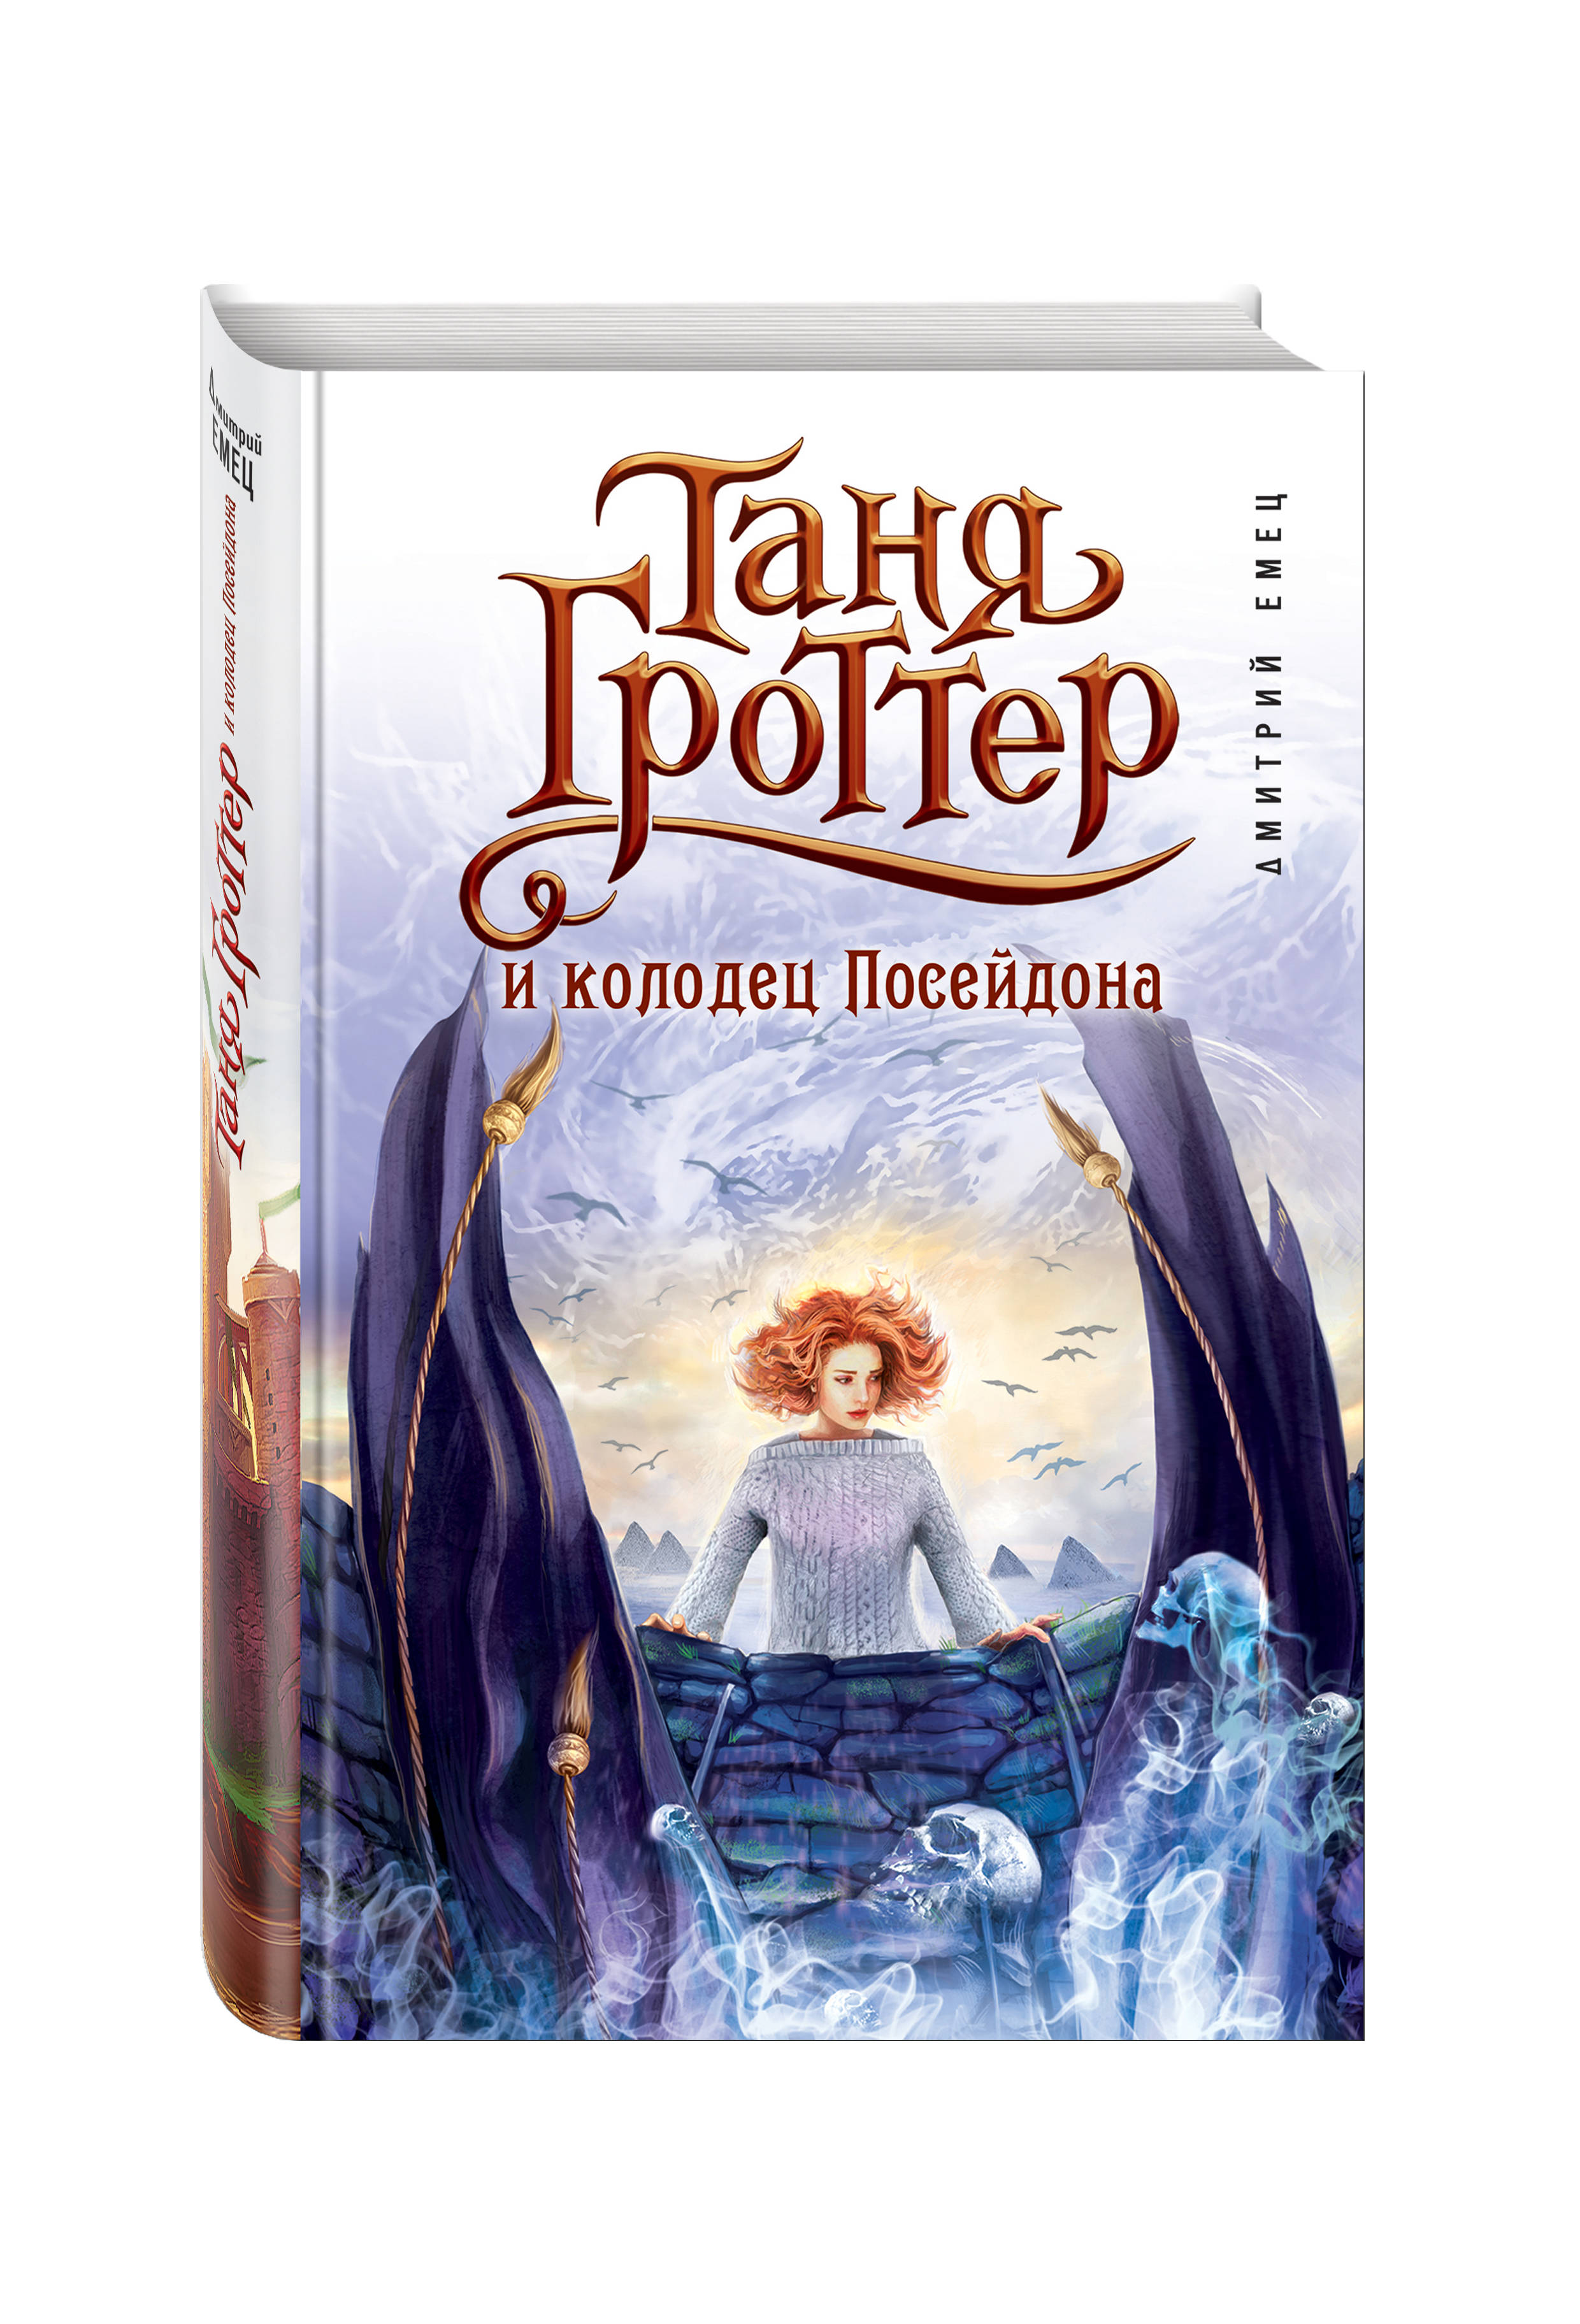 Таня Гроттер и колодец Посейдона